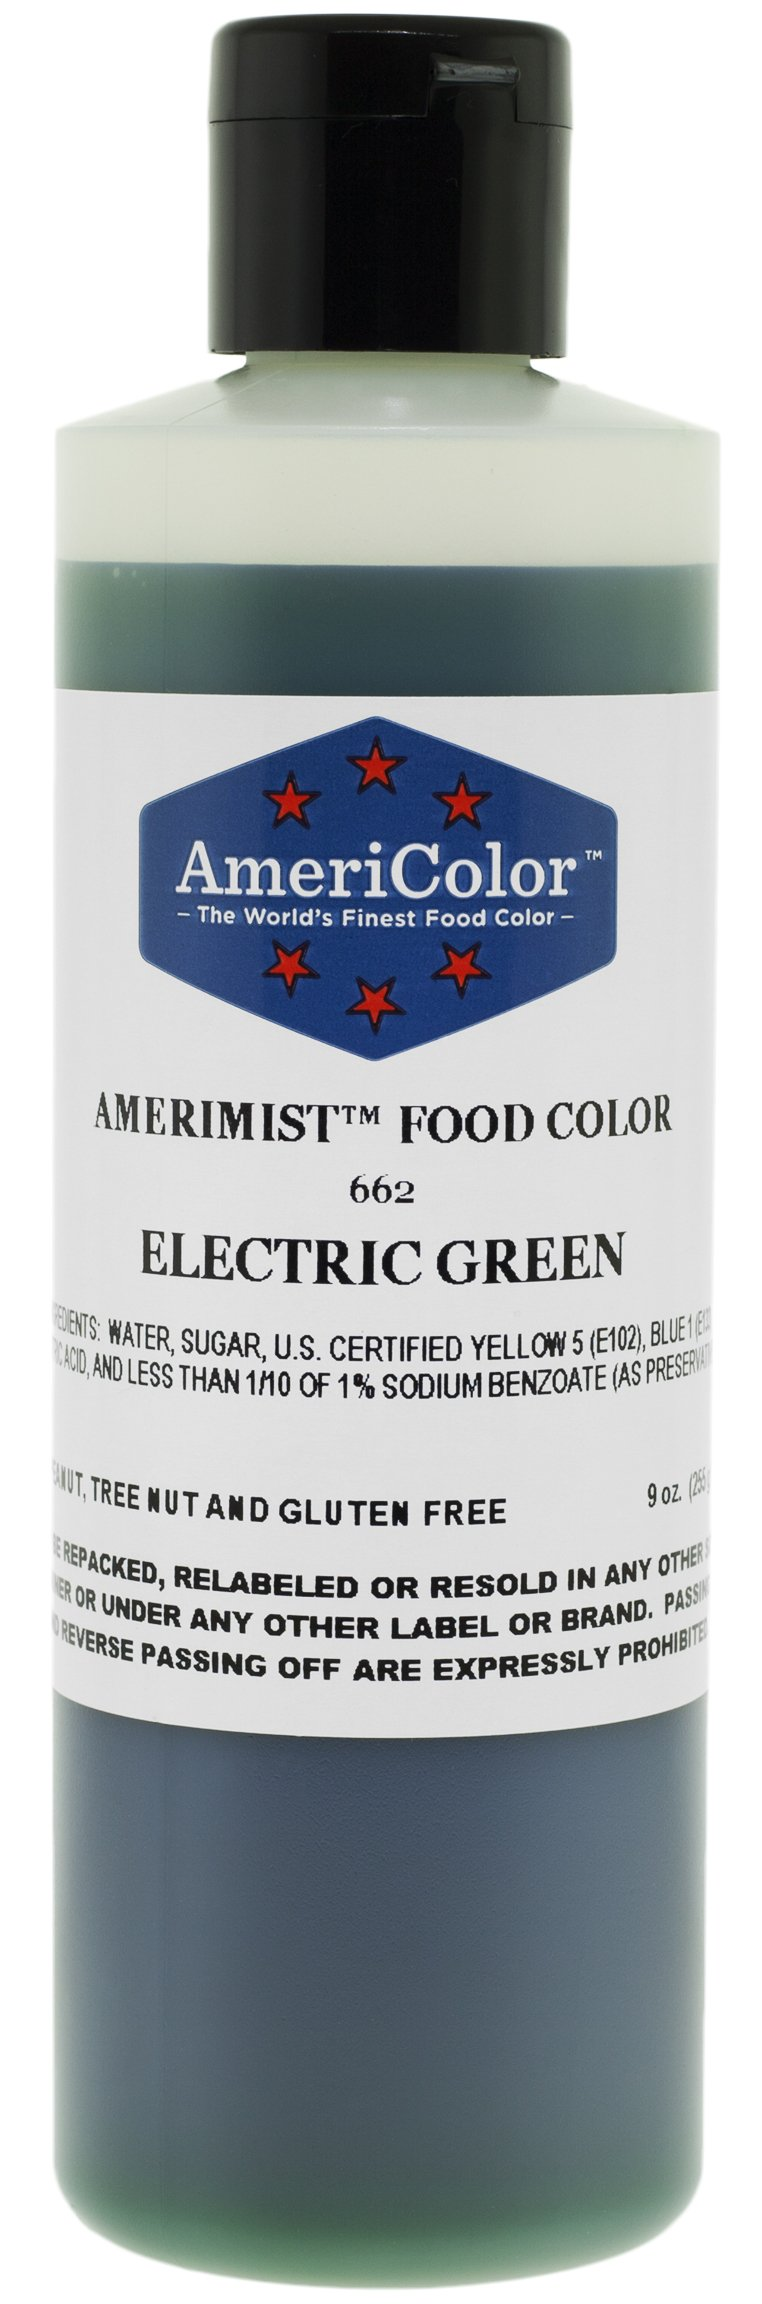 AmeriColor AmeriMist Electric Green Airbrush Food Color, 9 oz